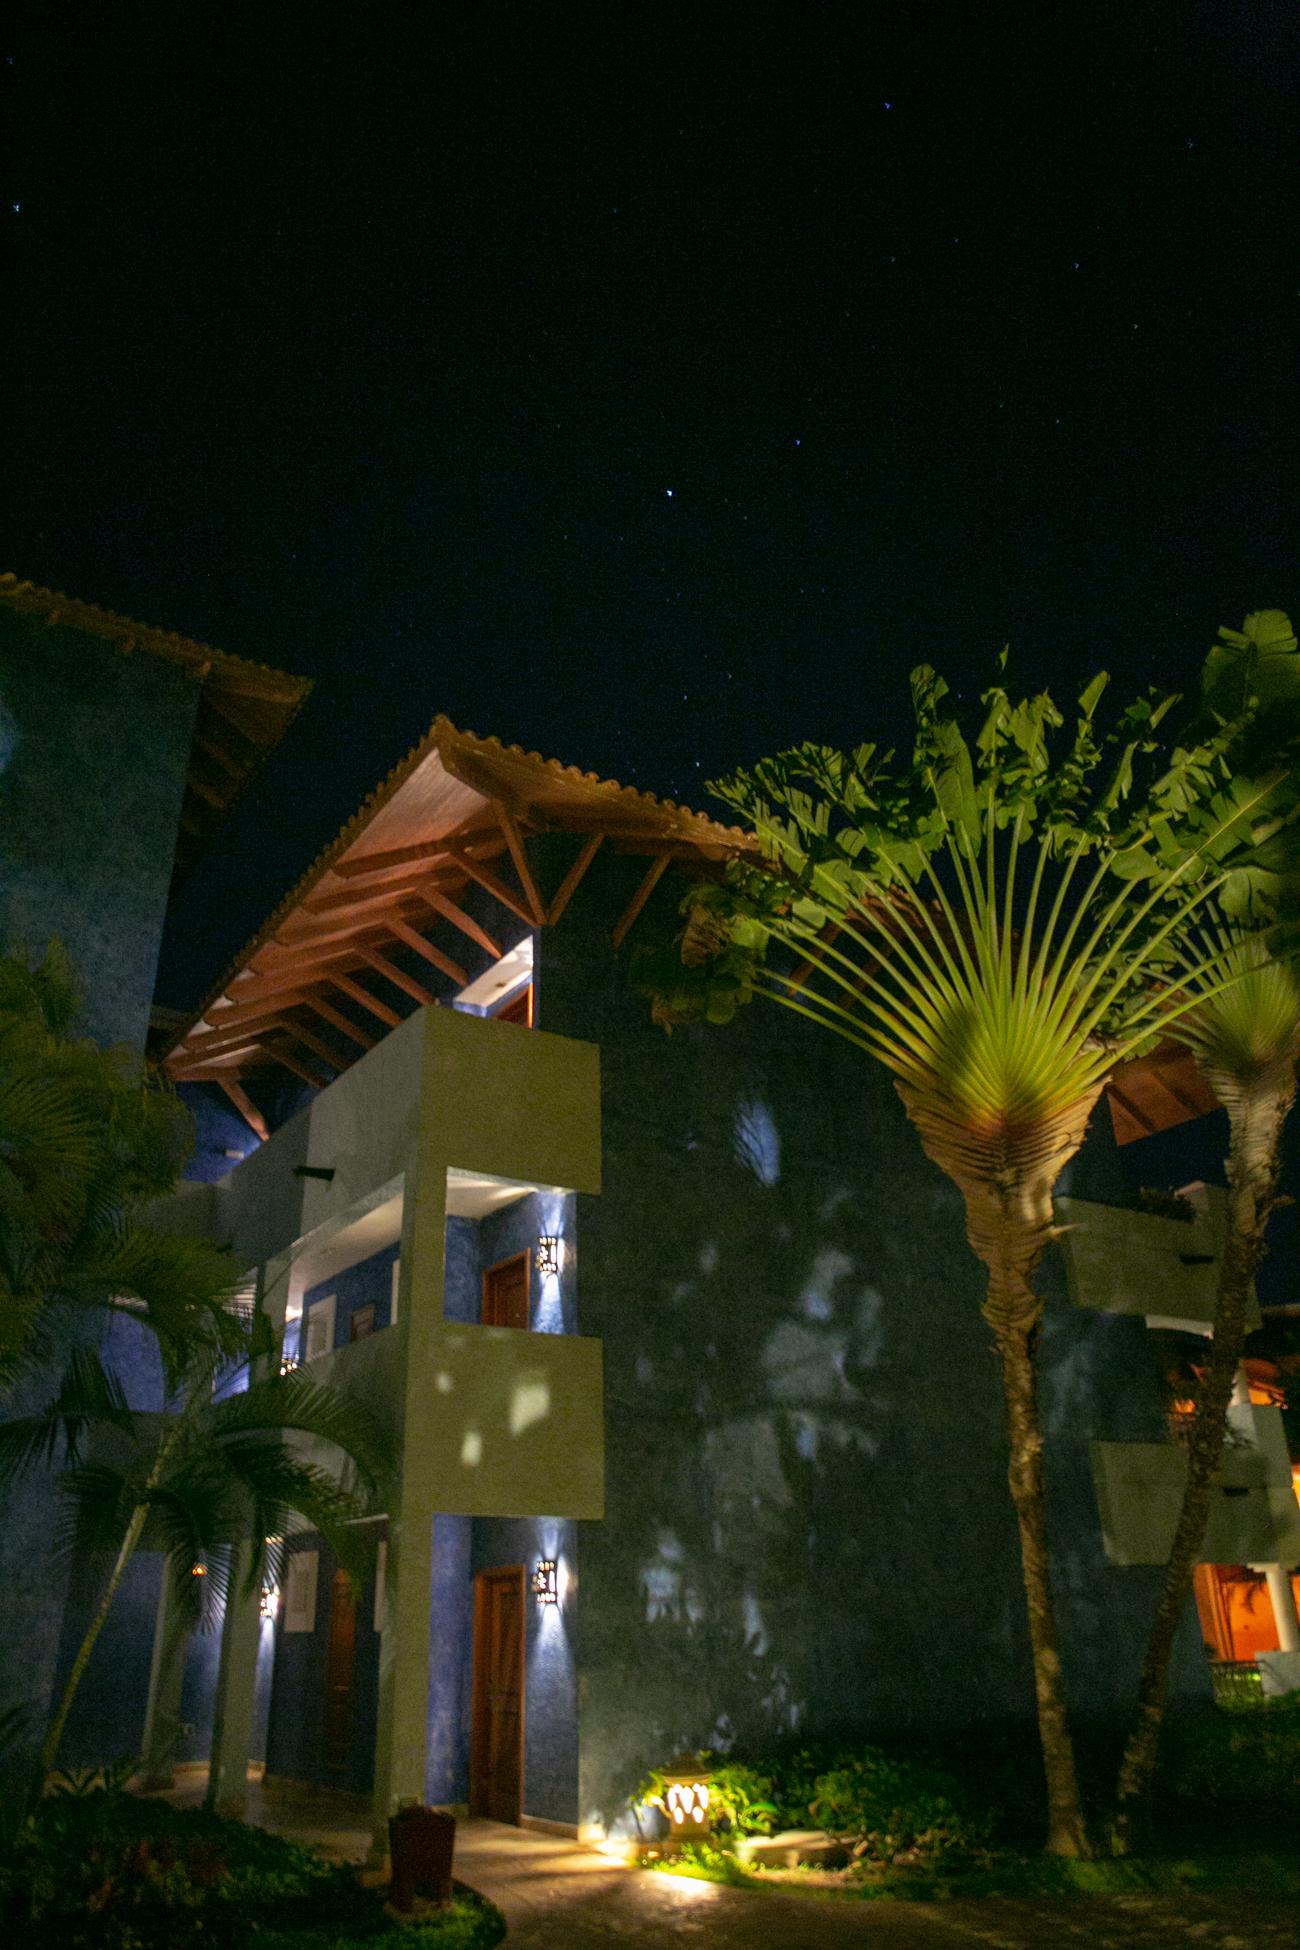 Midnight mega fern by our doorstep.